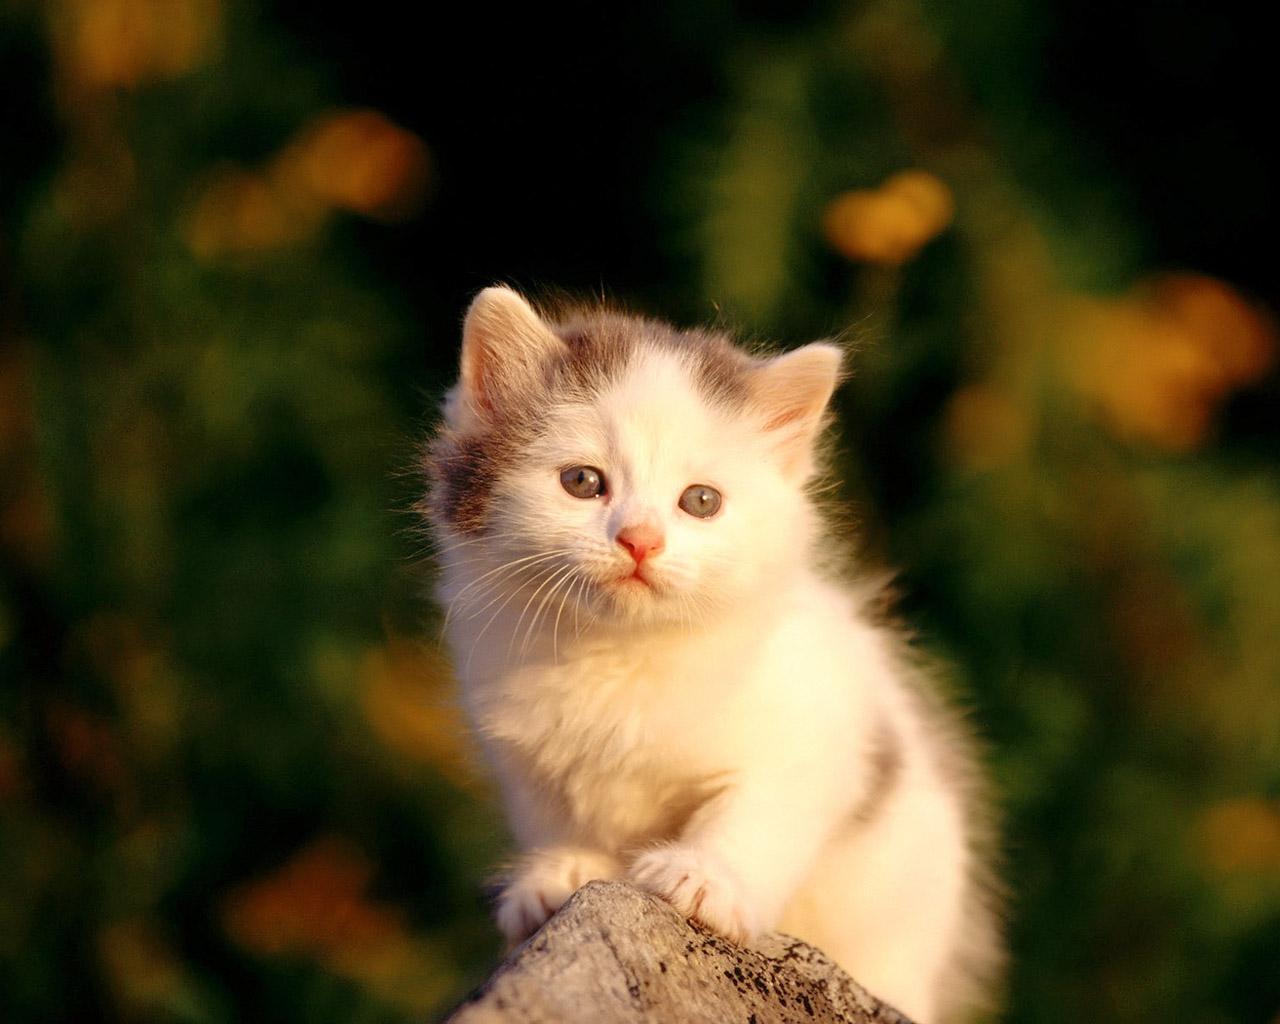 cute kitten wallpaper kittens - photo #5